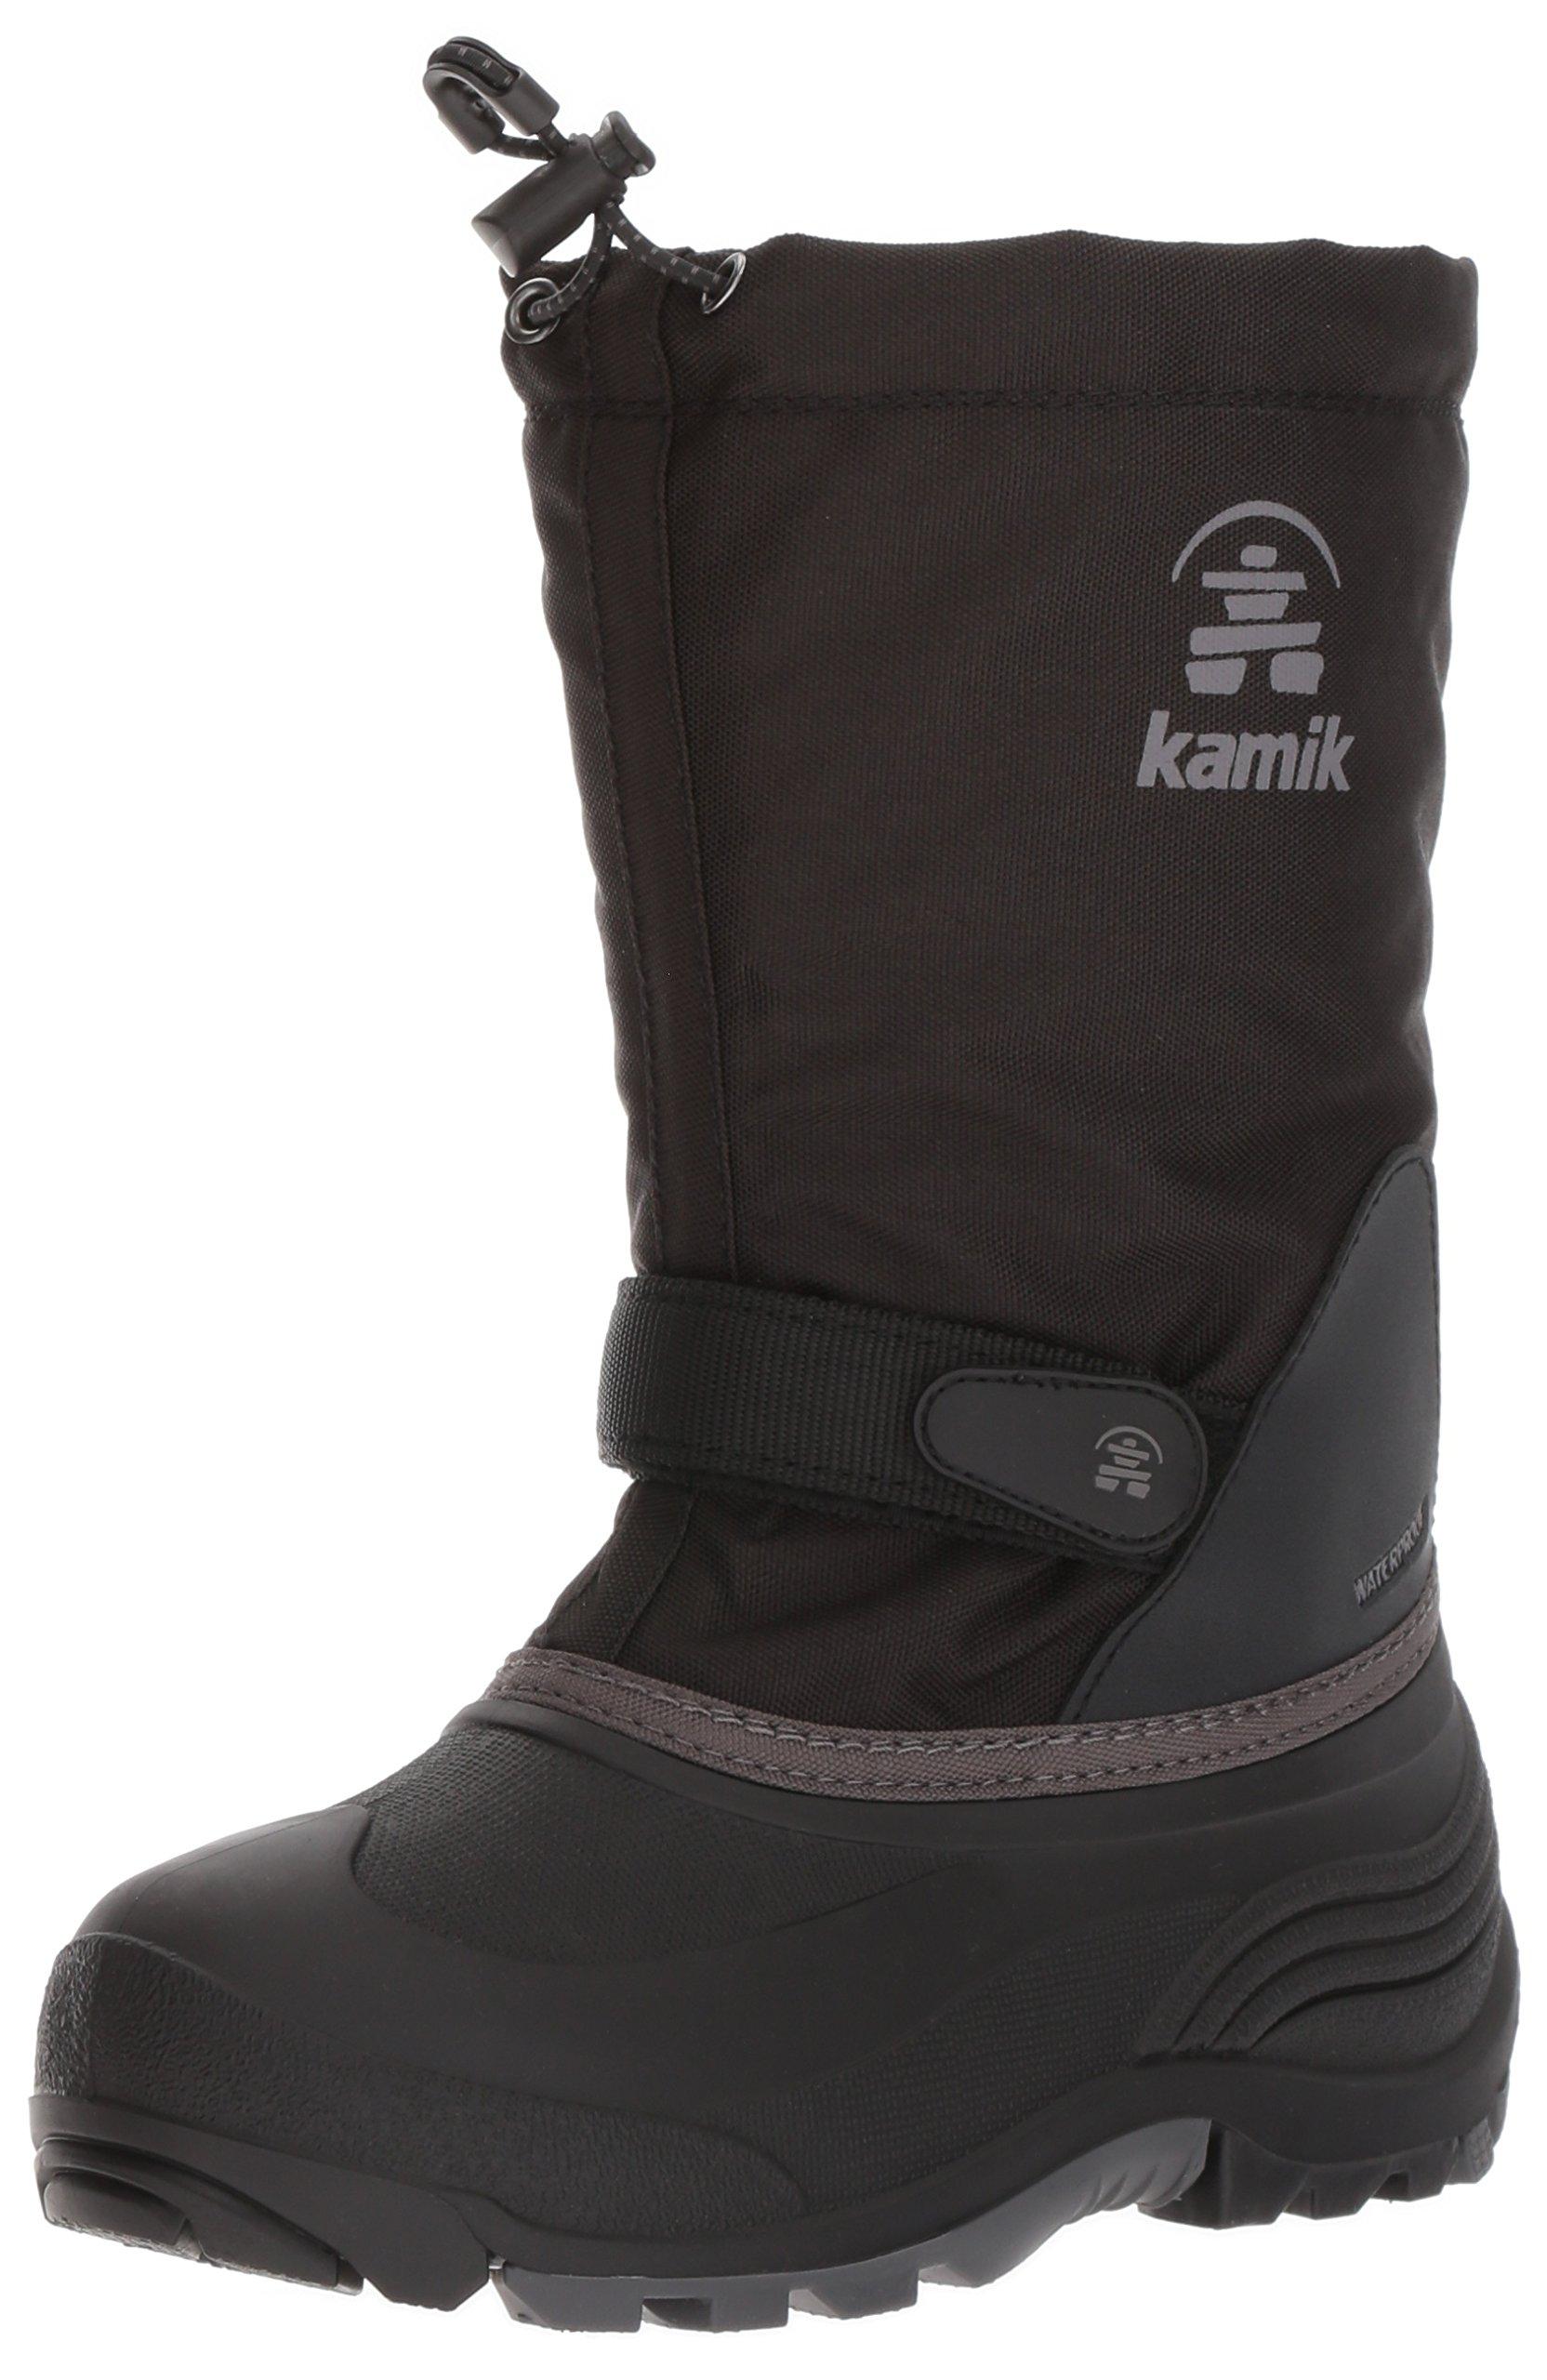 Kamik Kids Waterbug5 Snow Boot, Black/Charcoal, 5 Medium US Big Kid